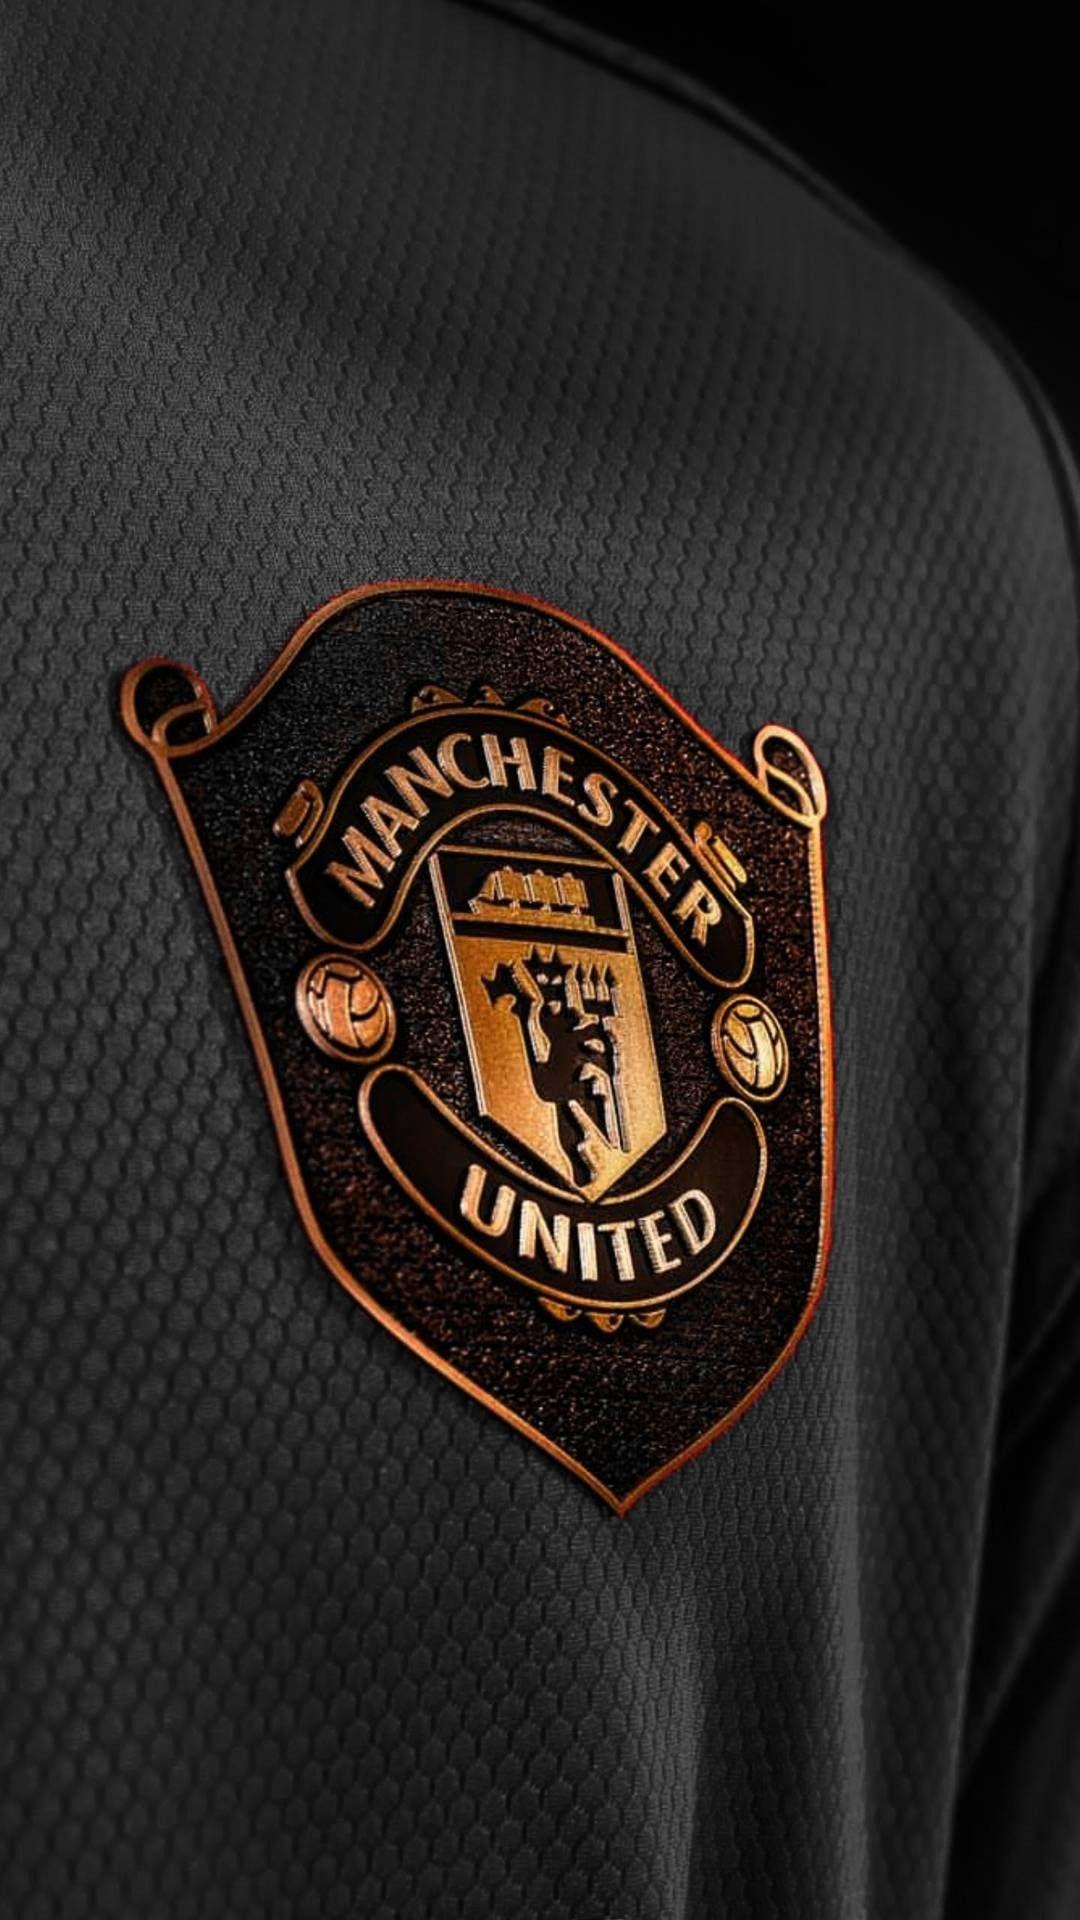 Man Utd Manchester United Wallpaper Manchester United Logo Manchester United Team